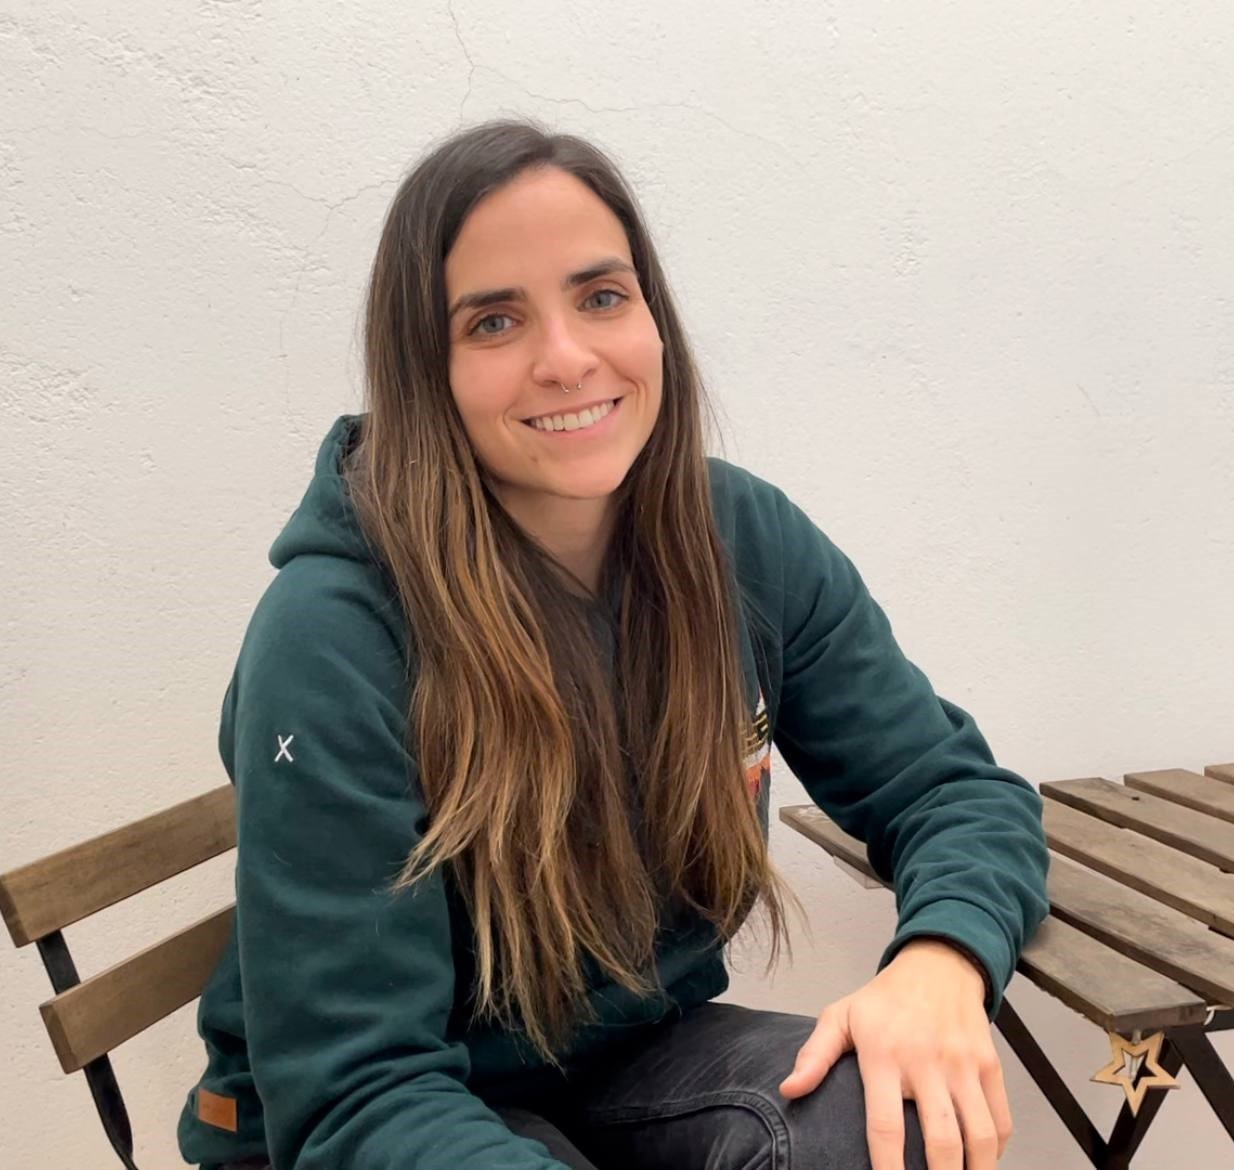 Marta-Barrio-Marcos